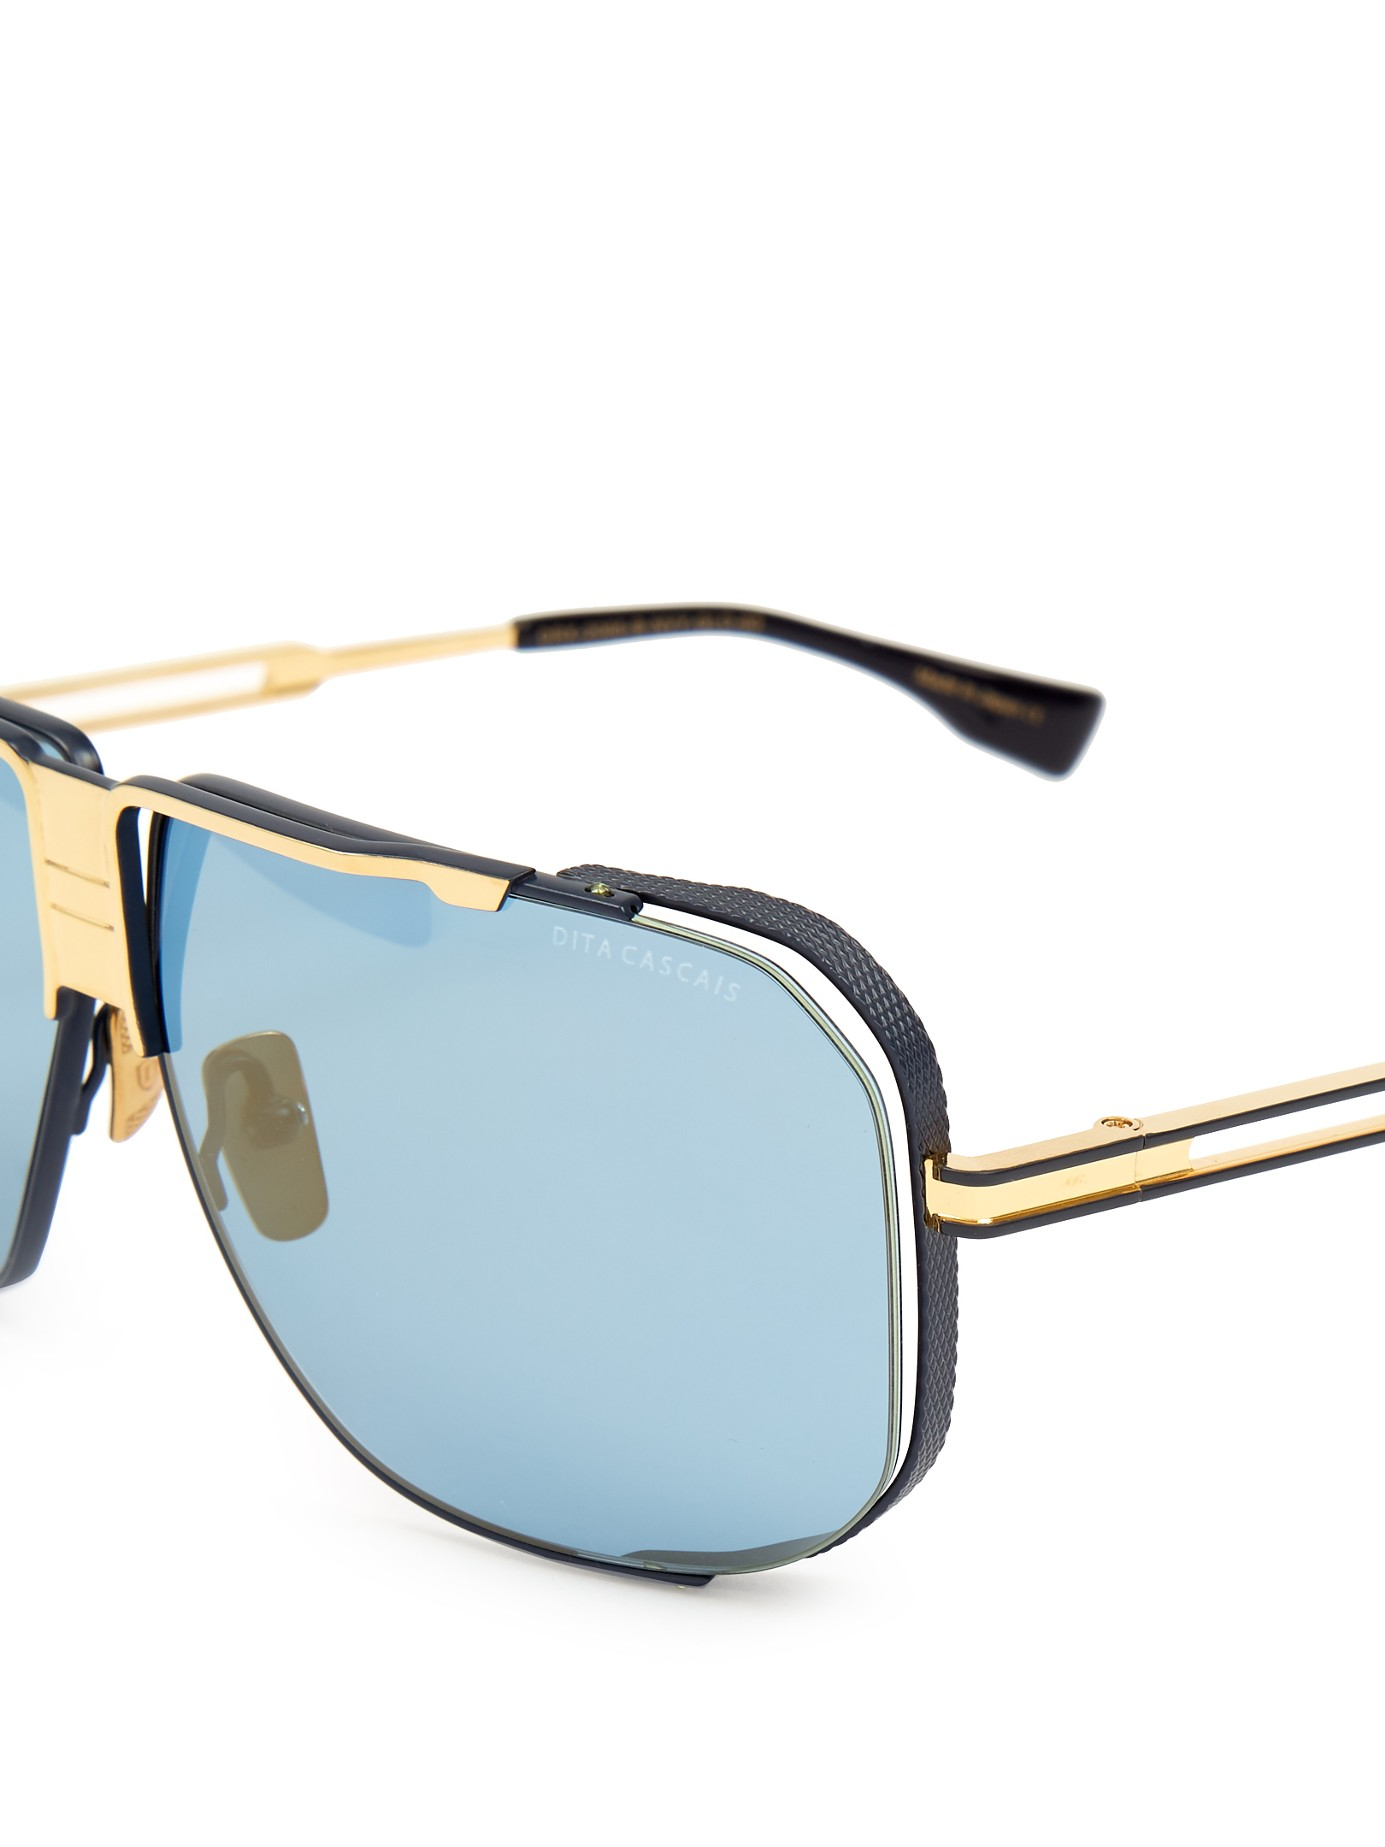 ba6e13b741a Dita Eyeglasses For Men